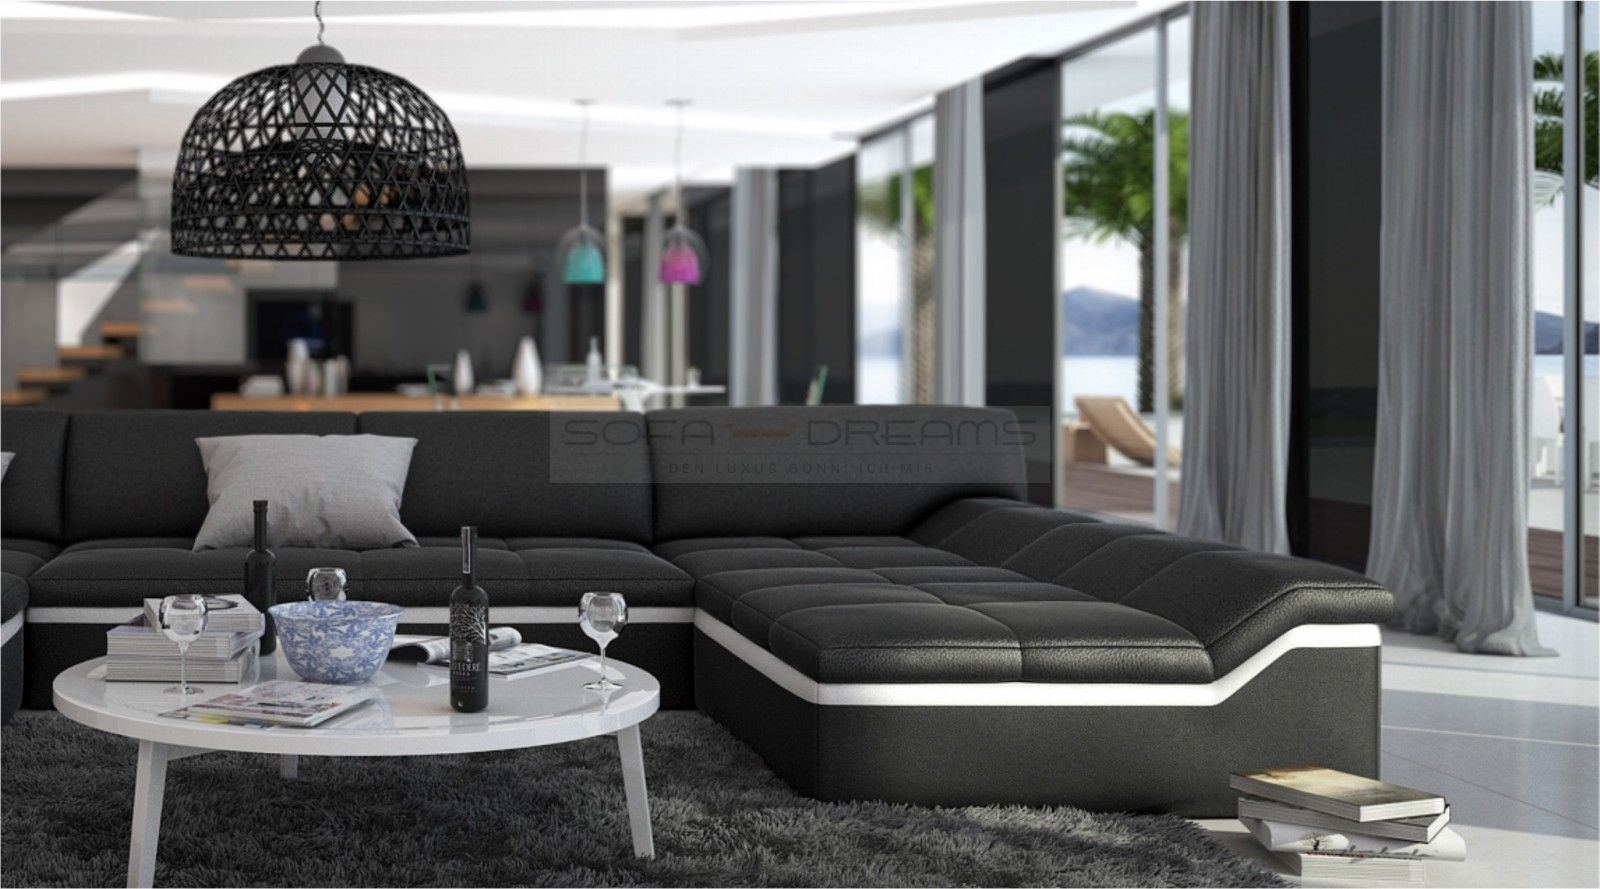 Moderne wohnlandschaft barari u form sofa design couch for Wohnlandschaft sofa